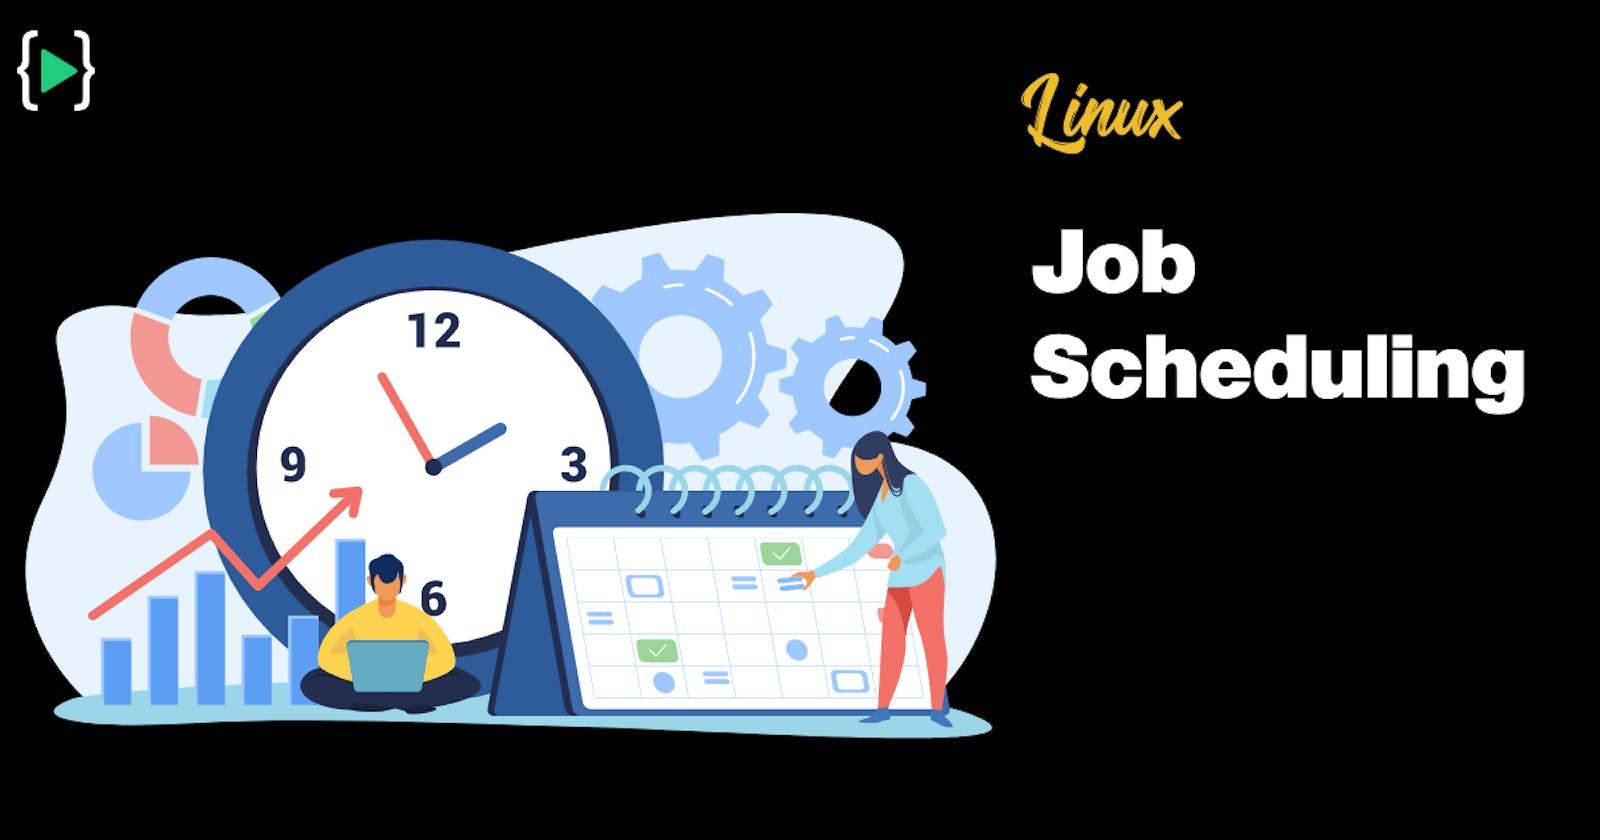 Linux Advanced - Job Scheduling